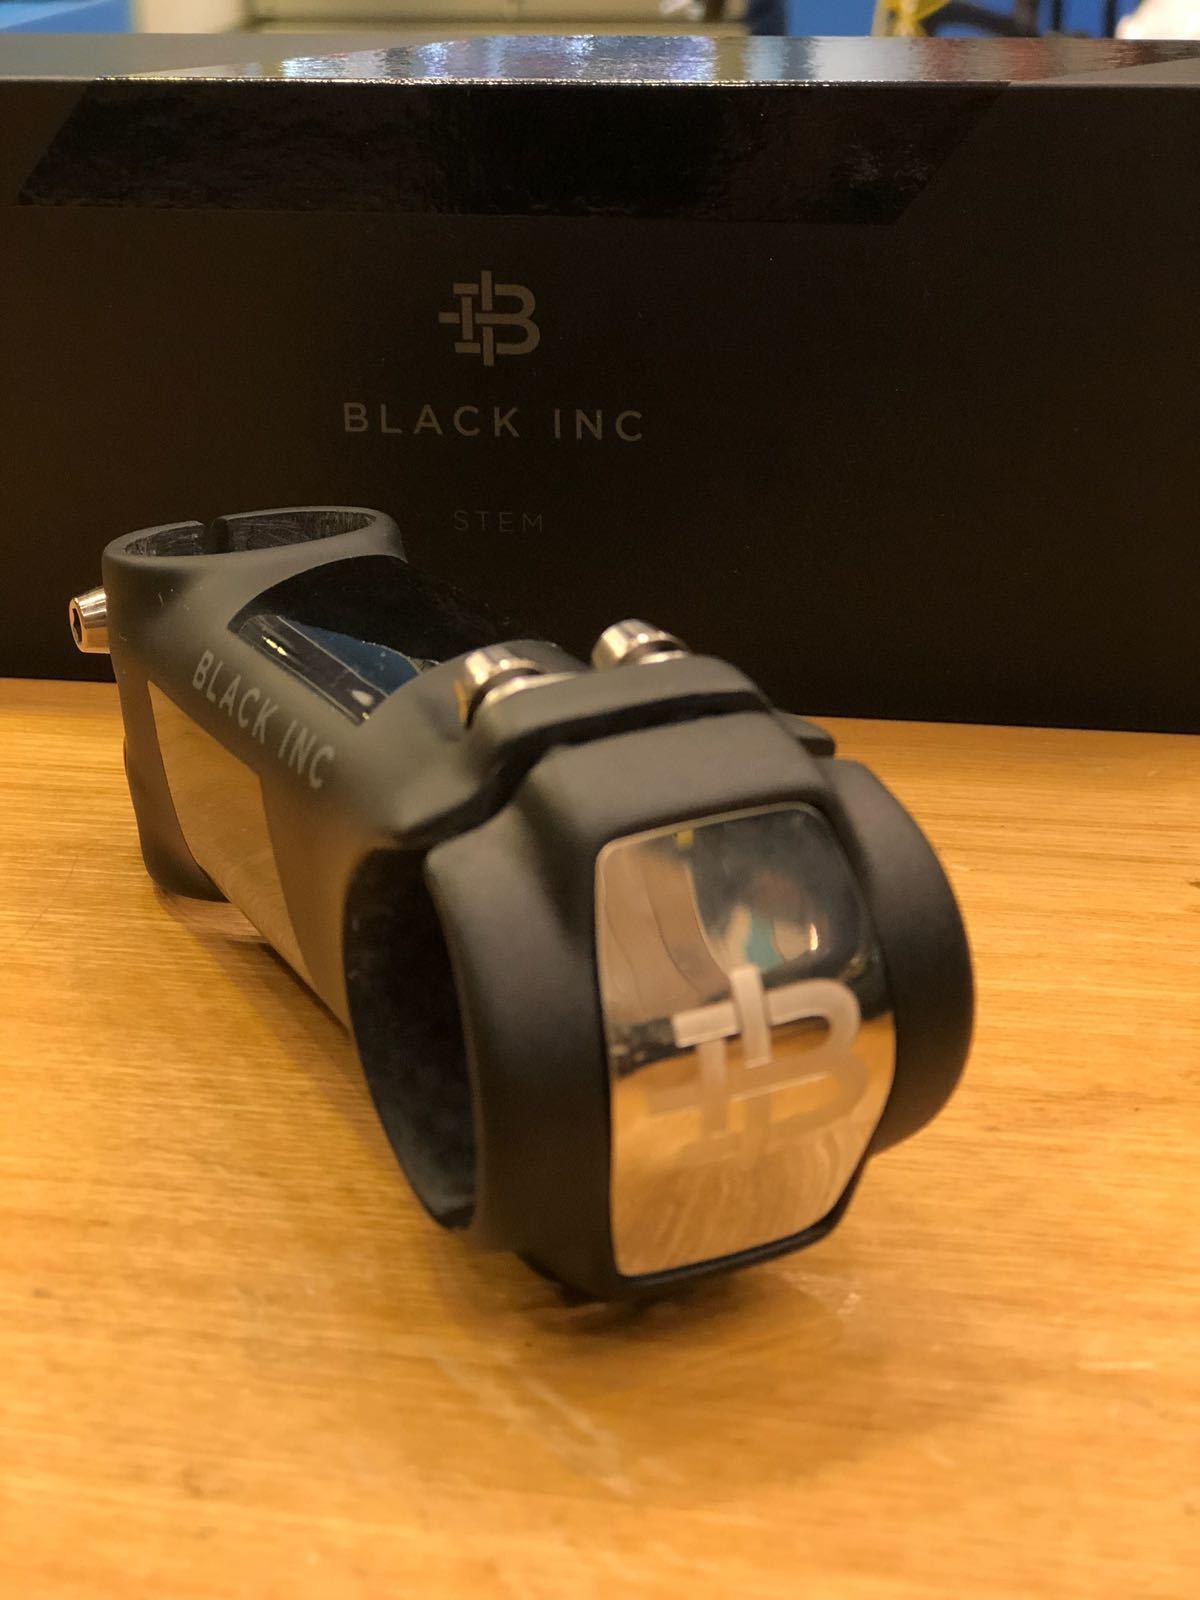 Black Inc Carbon Fiber 6 Degrees 31.8x110mm Road Bicycle Stem Matte-Black